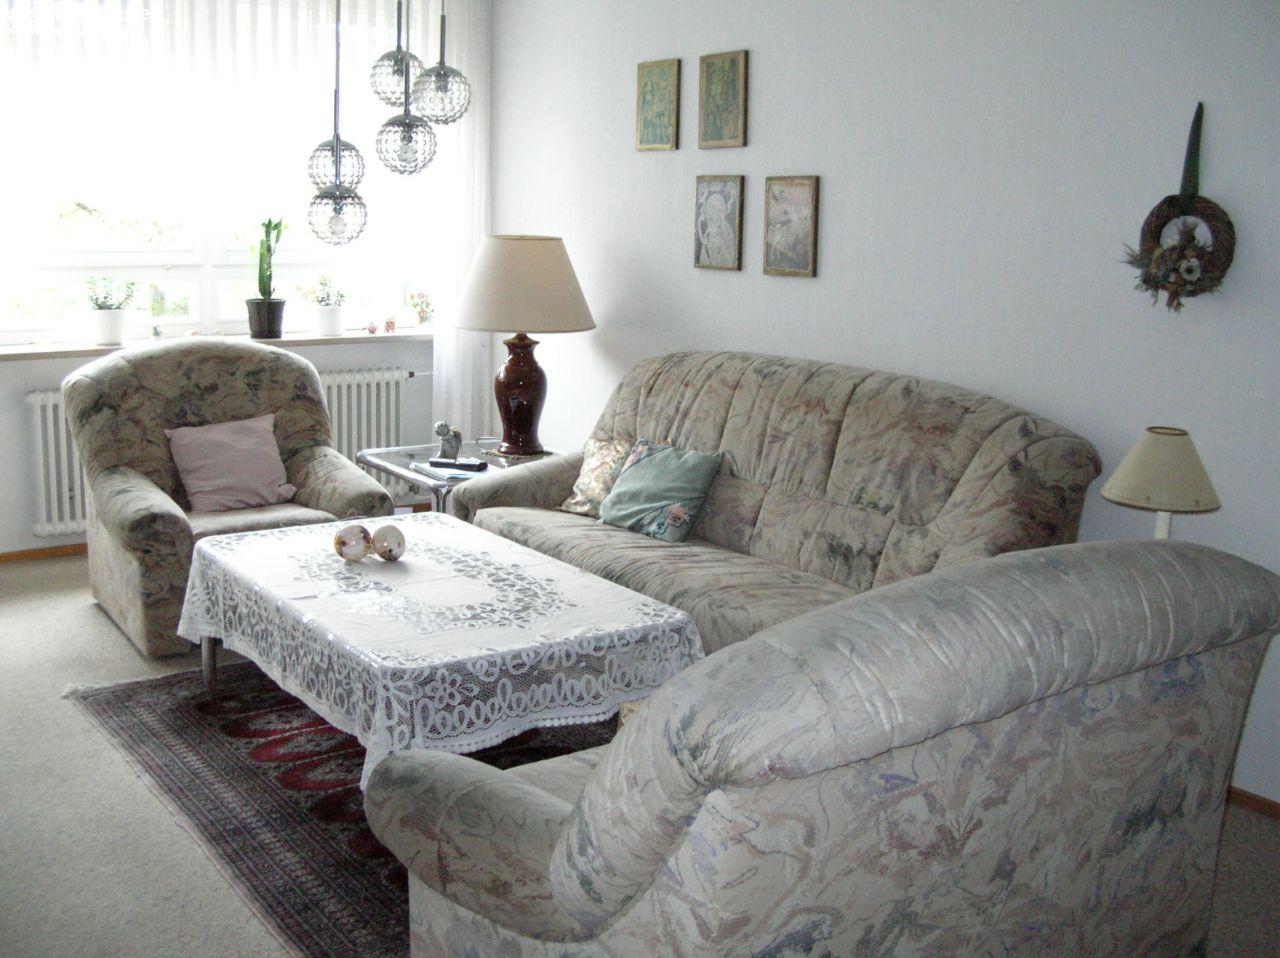 Immobilien n rnberg helle 2 zimmerwohnung in bester for Immobilien nurnberg privat